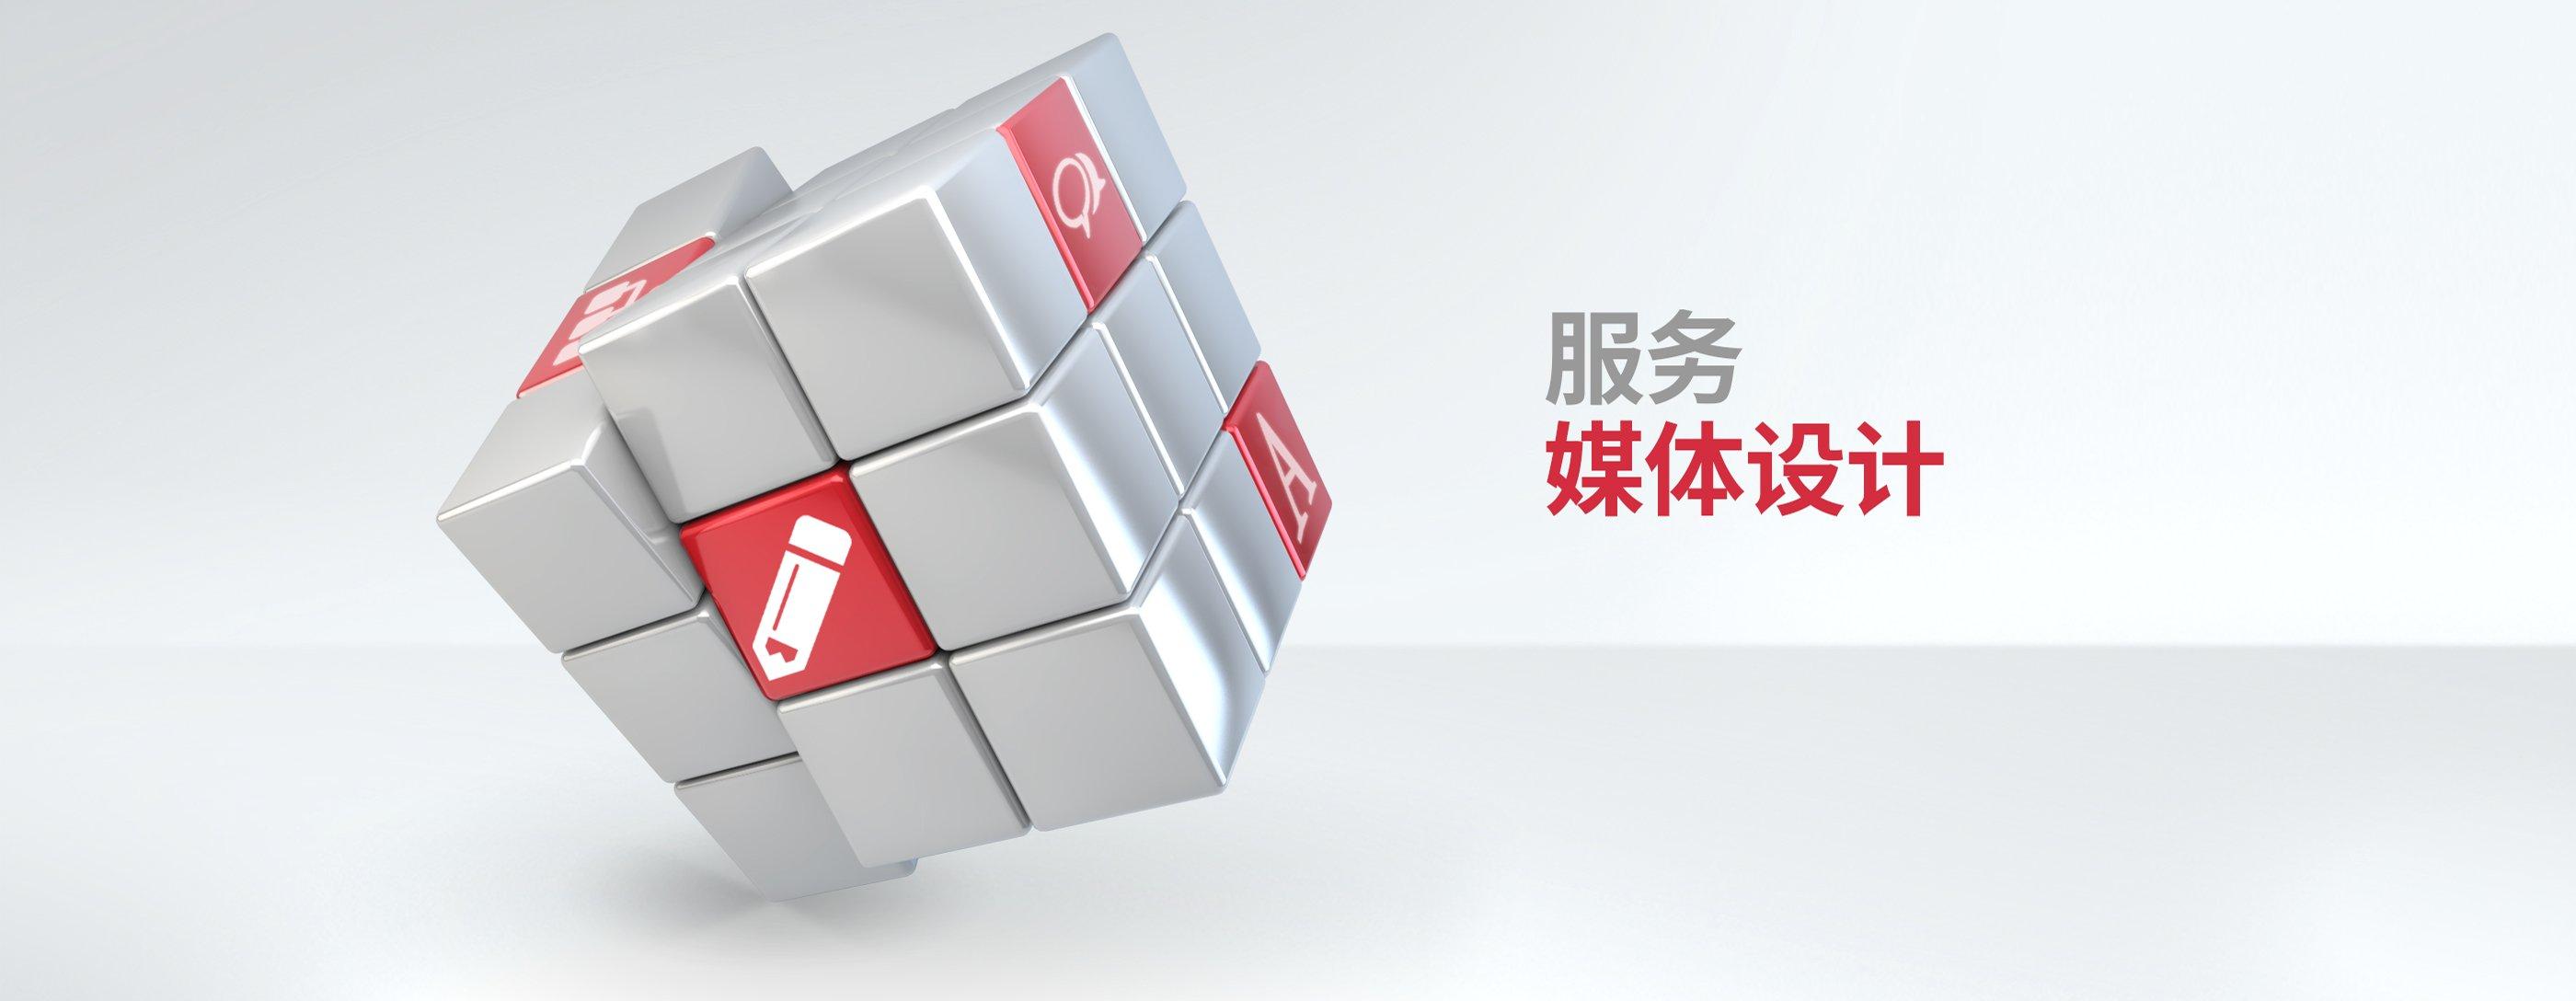 W4 媒体设计